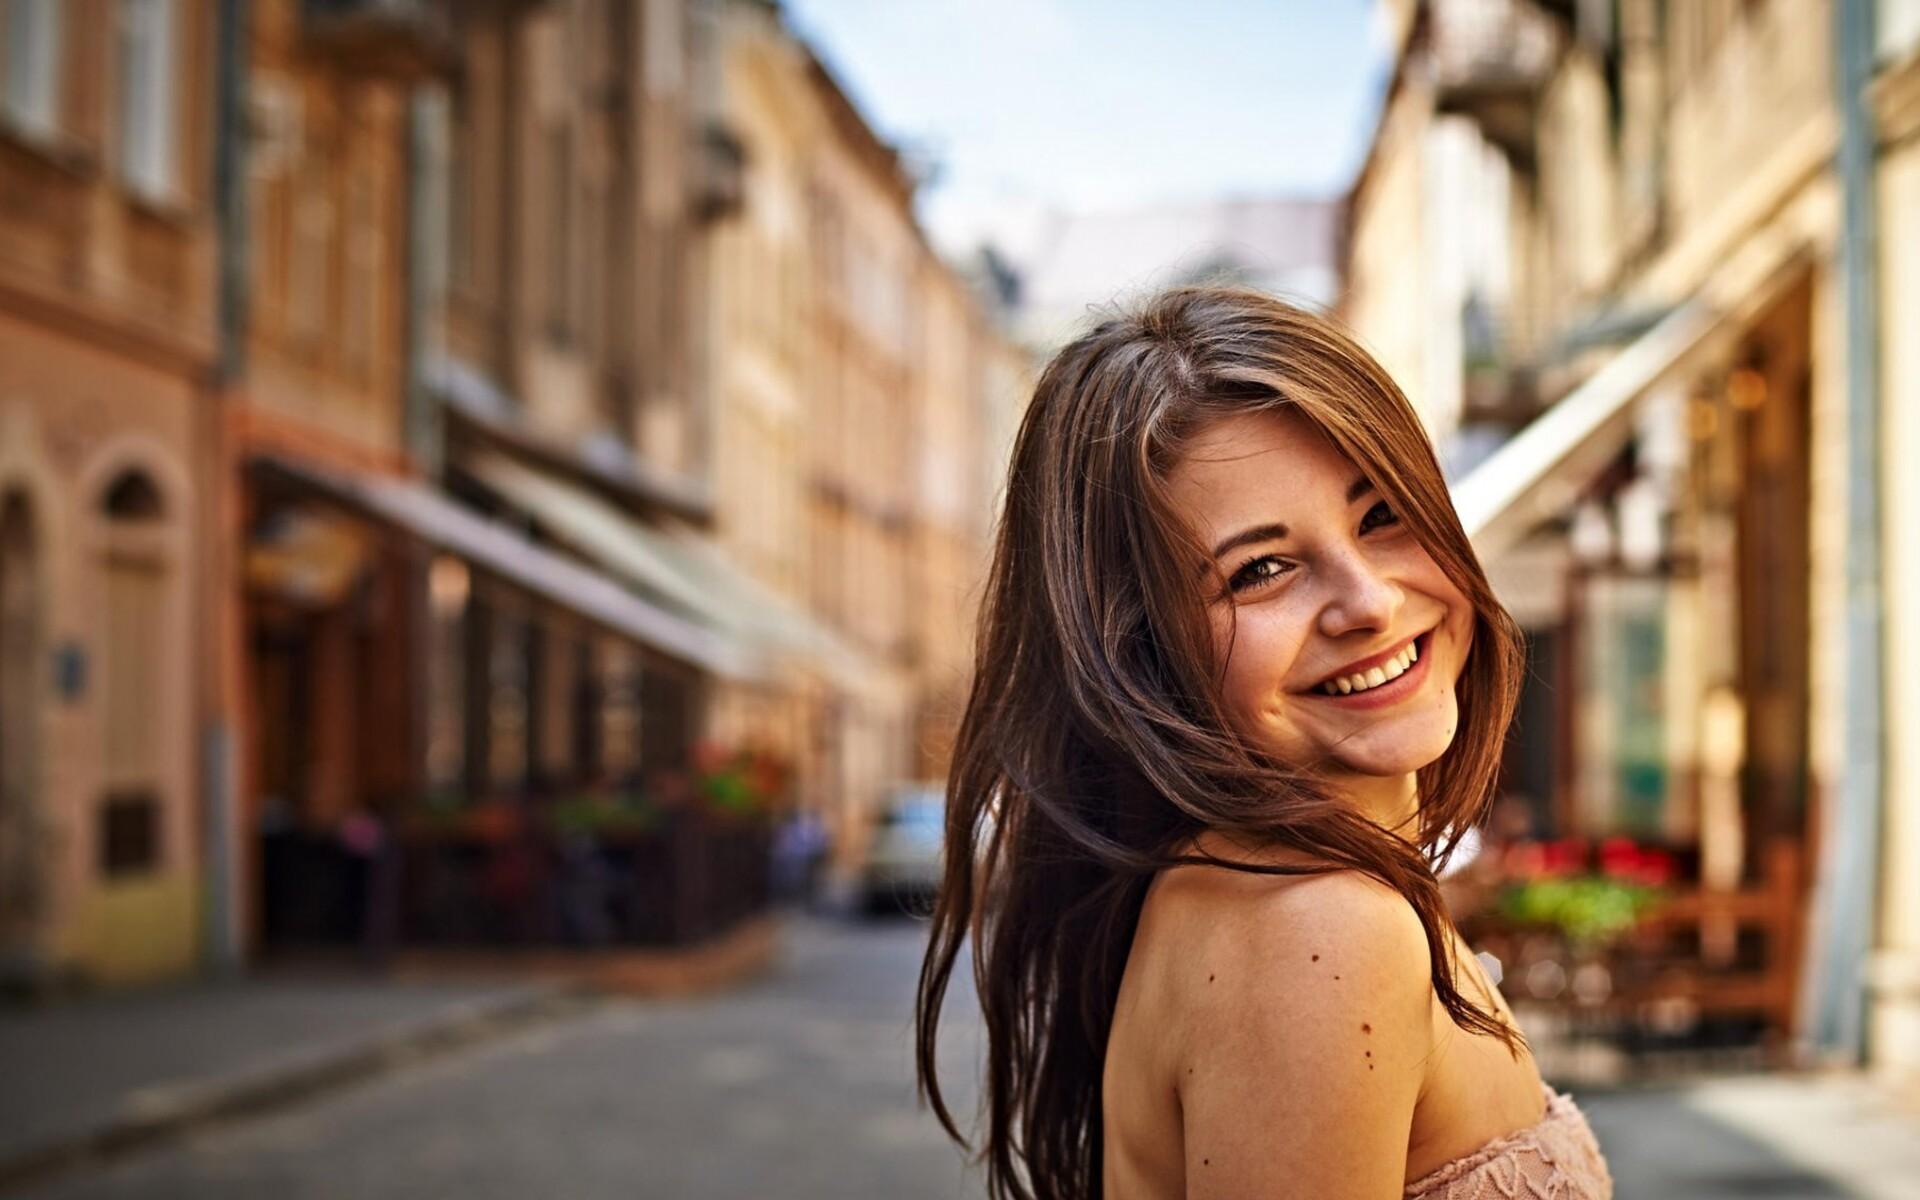 dana-kareglazaya-cute-smile-pic.jpg